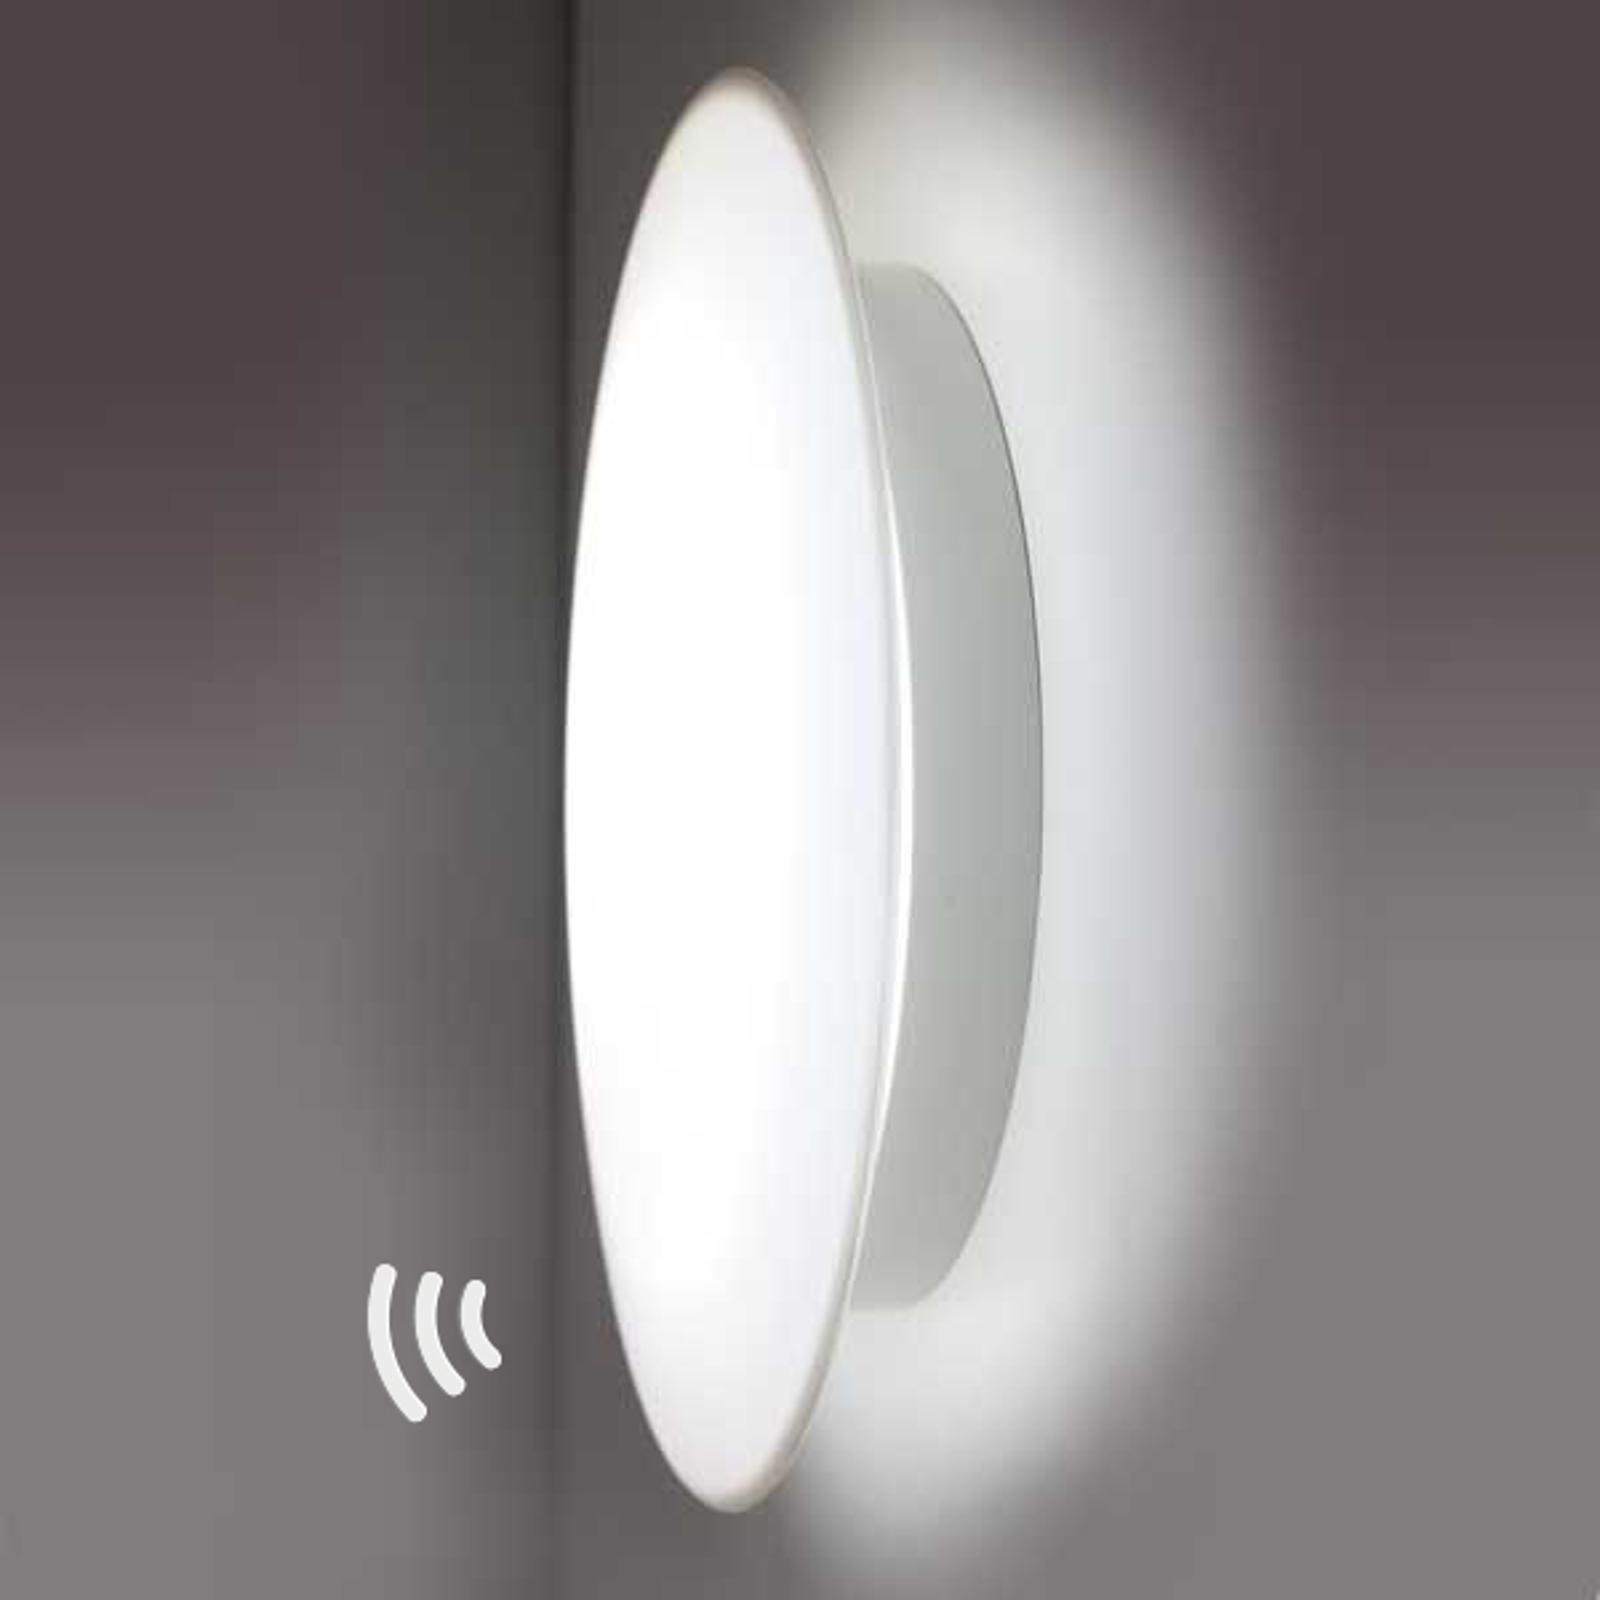 SUN 3 LED-lamp van de toekomst wit 13 W 4 K sensor